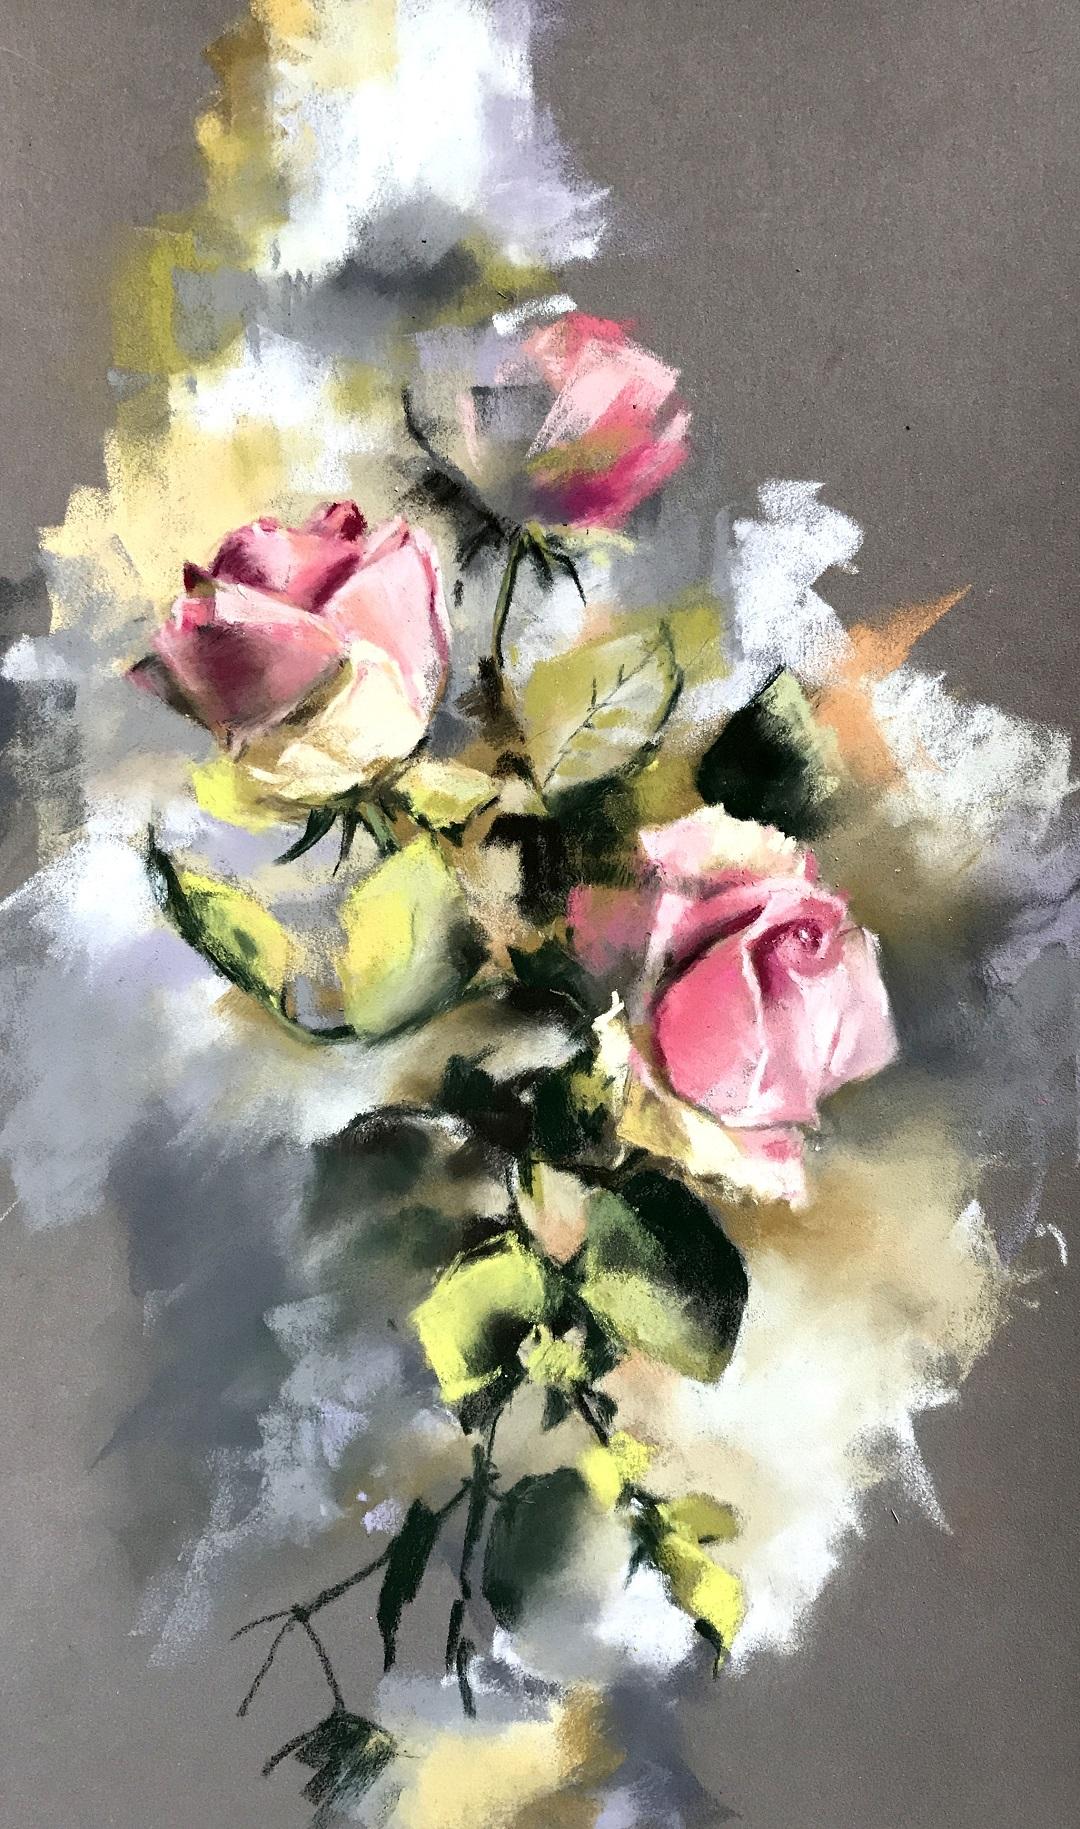 "'Roses' Sophie Rodionov Soft pastels on Pastelmat, 6 x 12"", 2017"